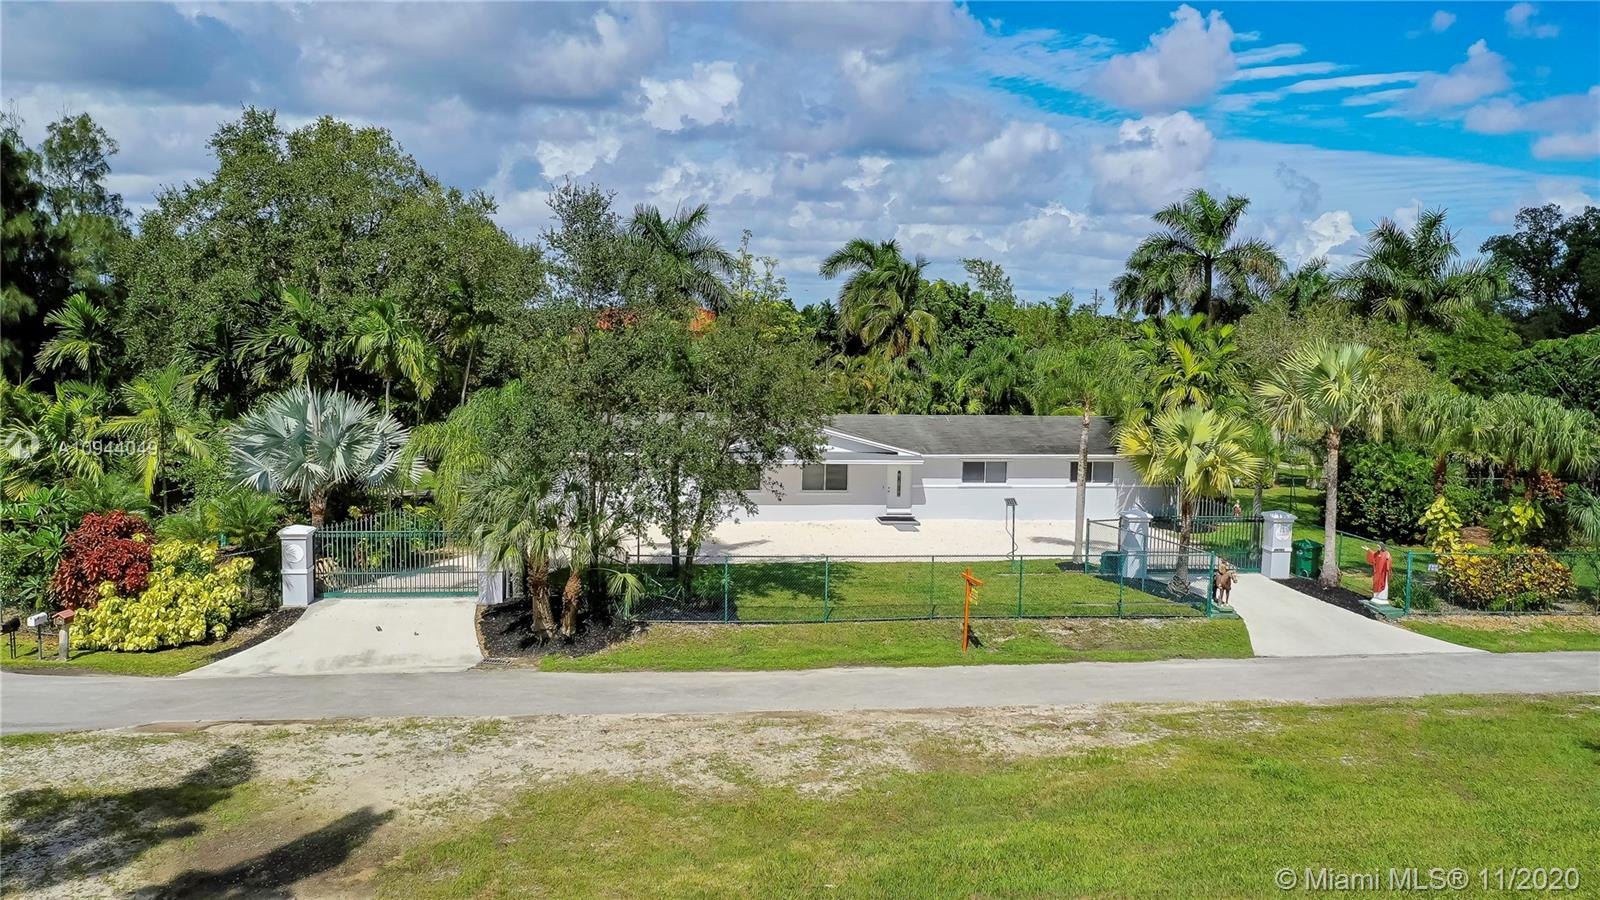 14751 SW 252 St Property Photo - Homestead, FL real estate listing